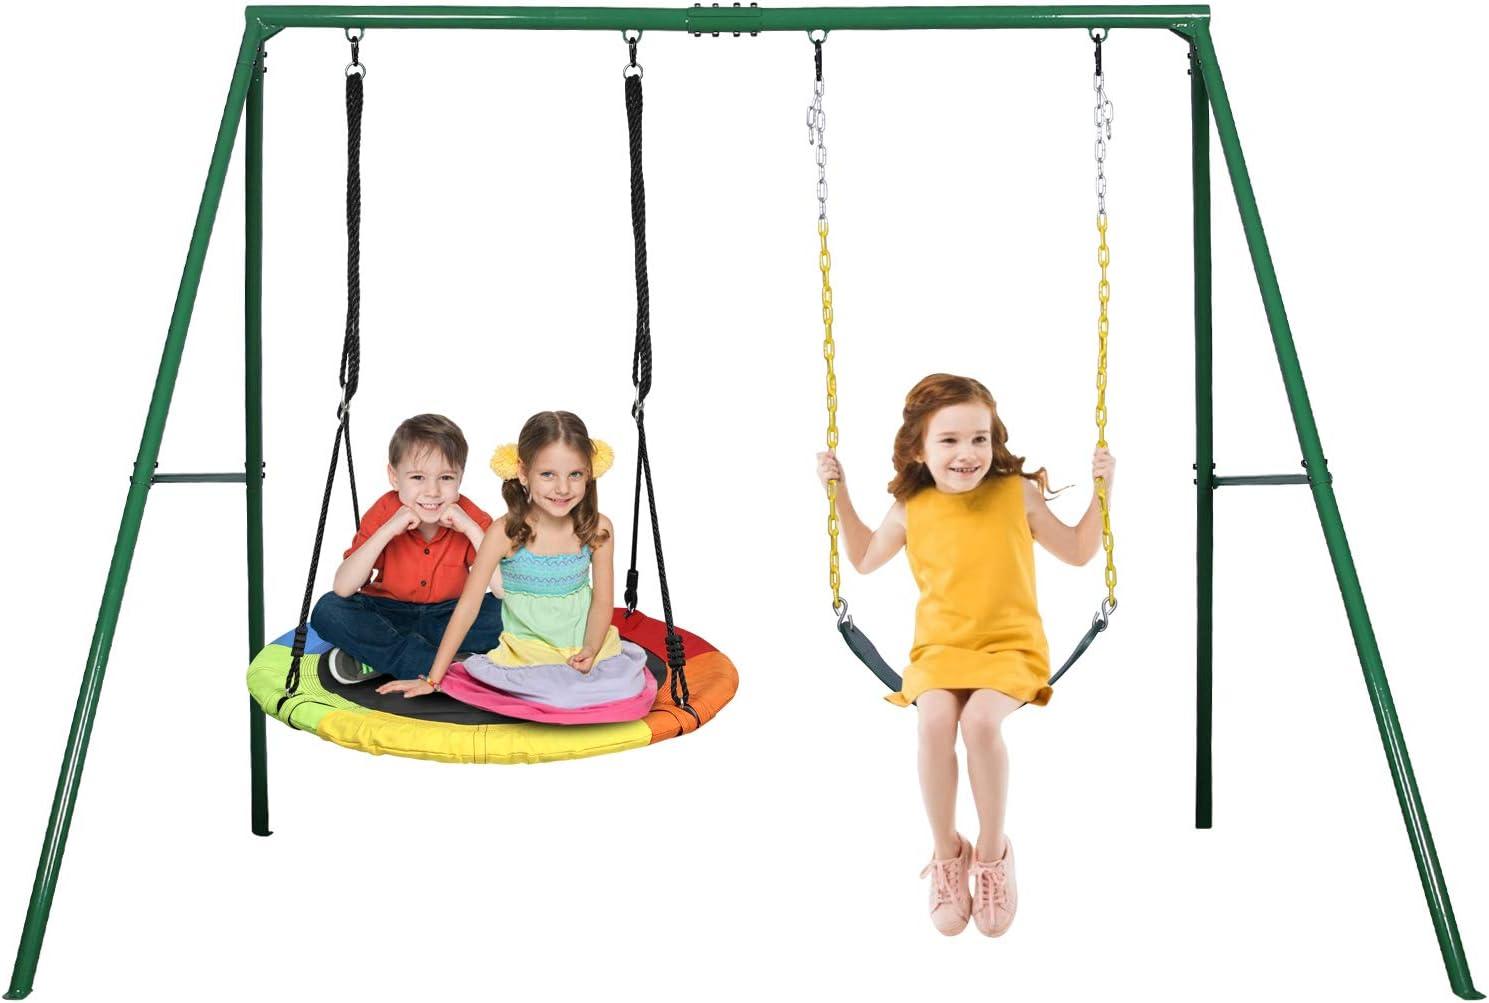 Trekassy 440lbs 2 Seat Swing Set